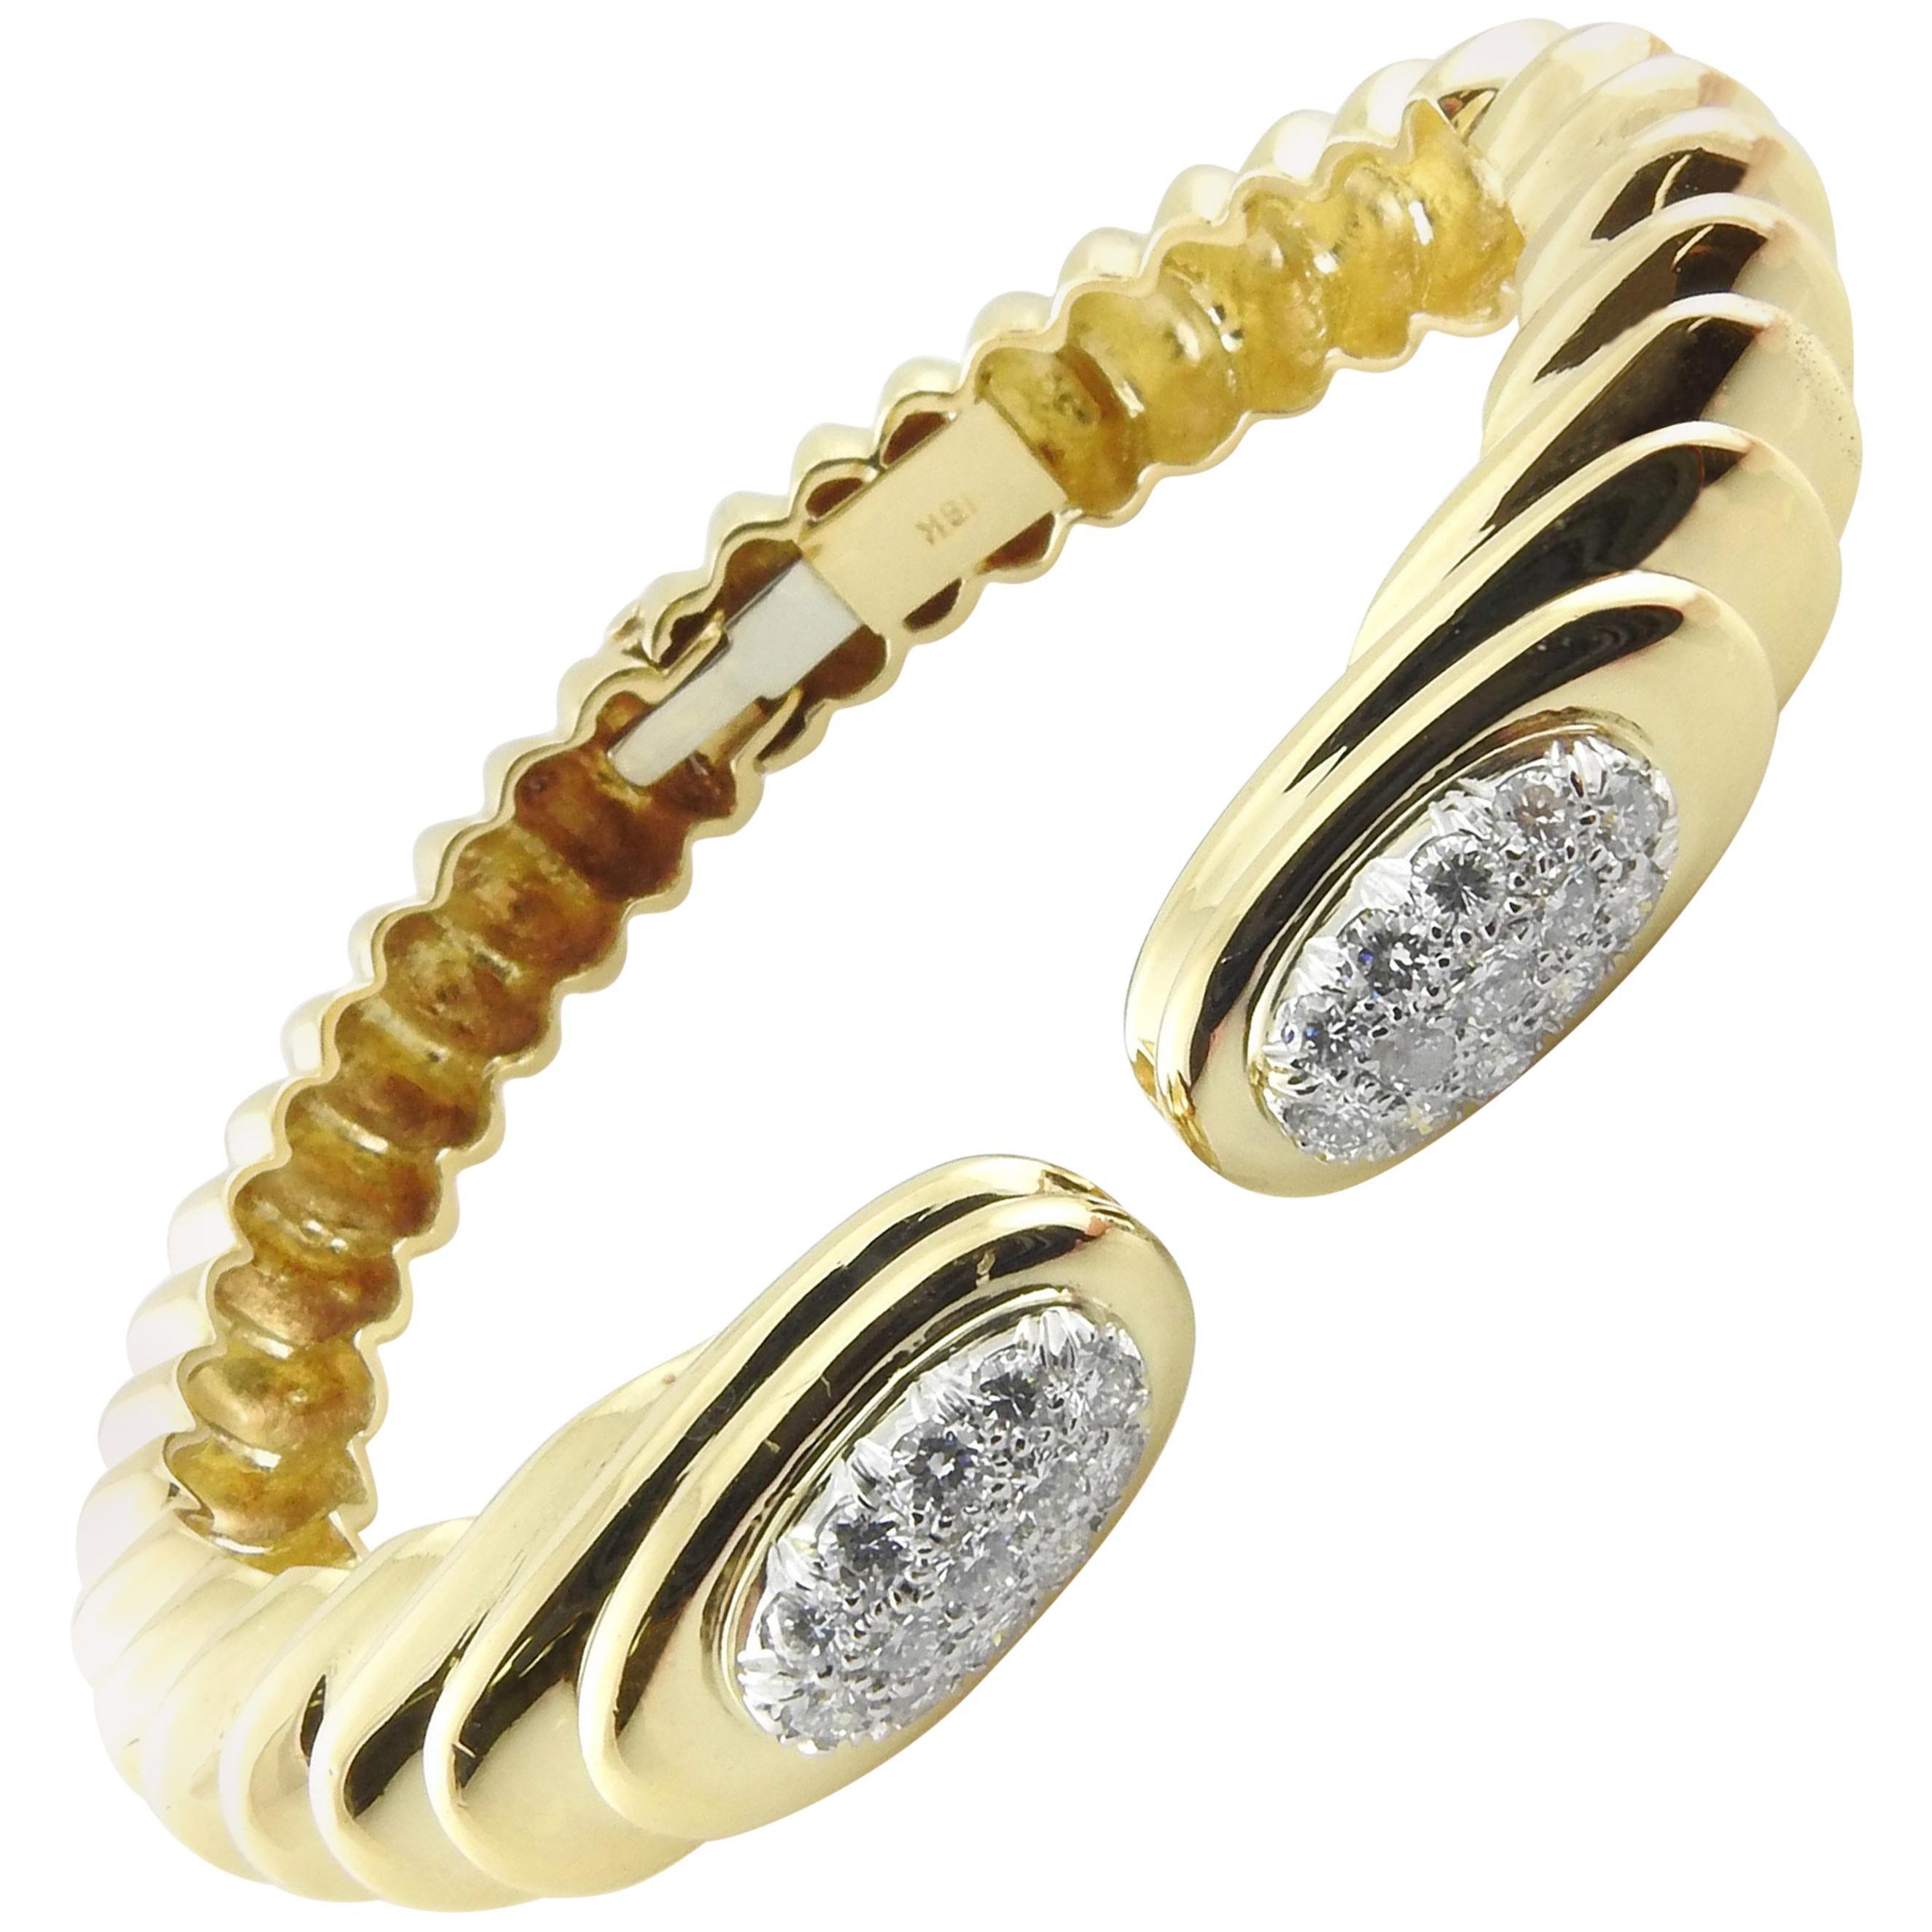 18 Karat Yellow Gold Pave Diamond Hinged Cuff Bangle Bracelet